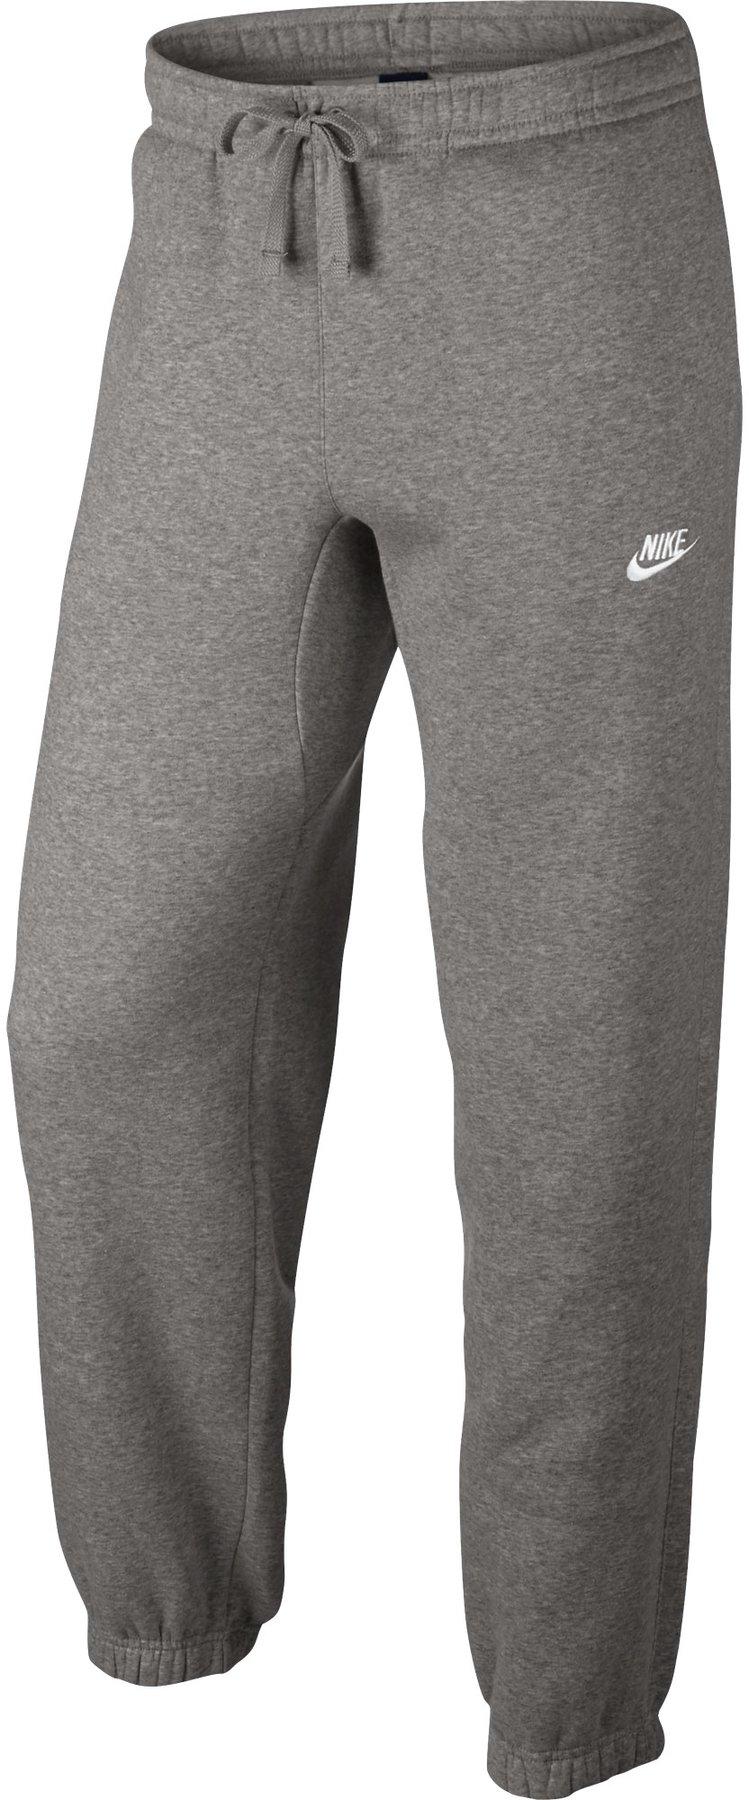 48858c15d7e1c3 Nike Trainingshose Herren kaufen